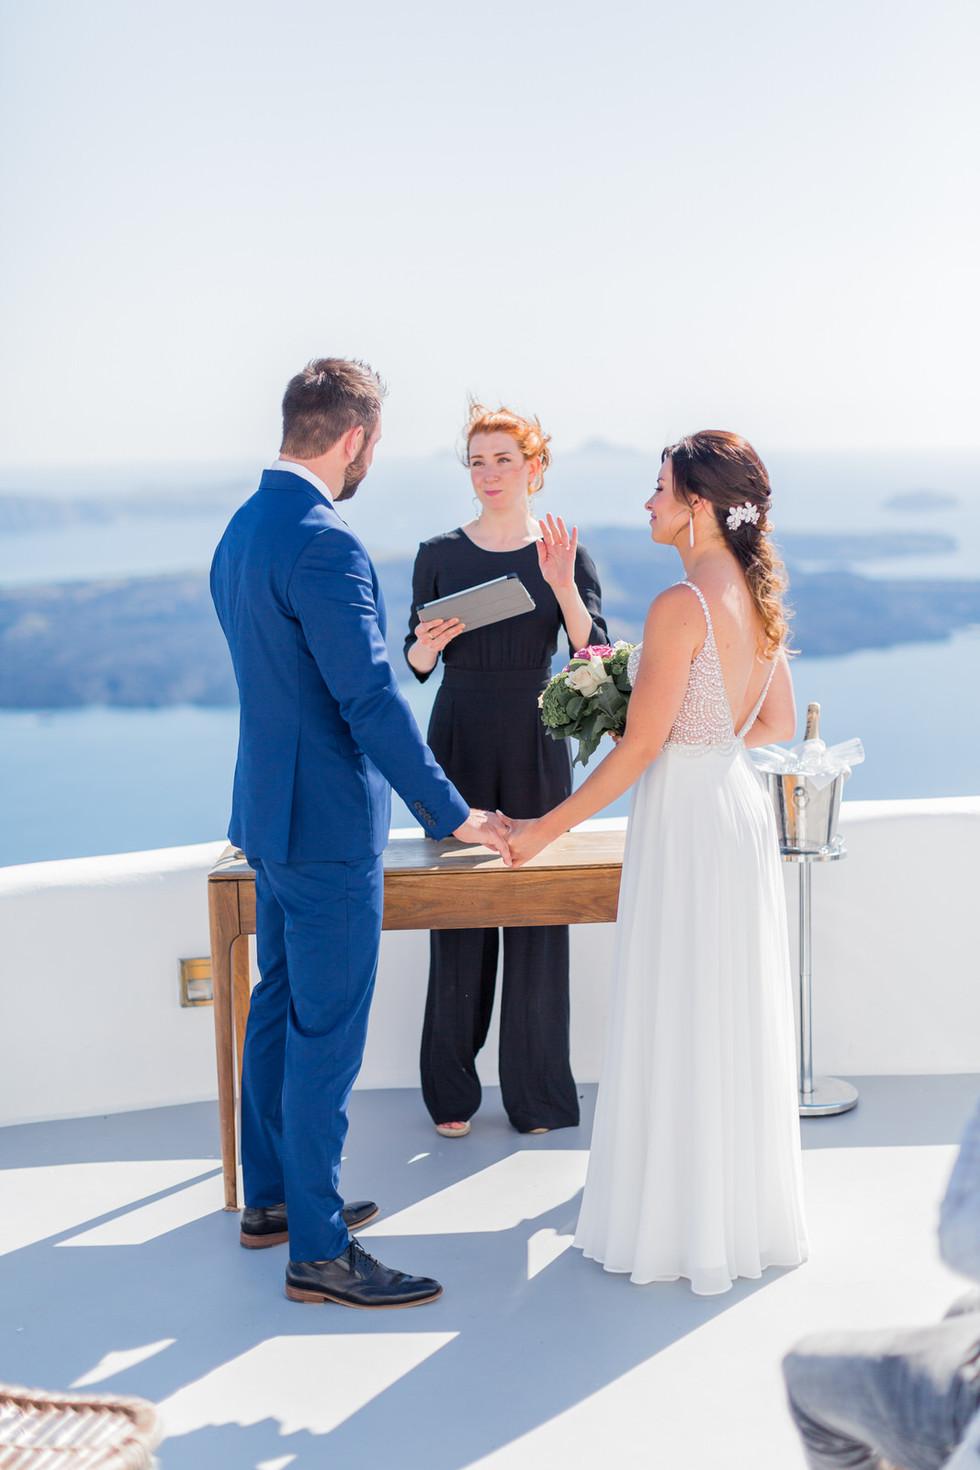 Santorini-Elopement- wedding-143.jpg